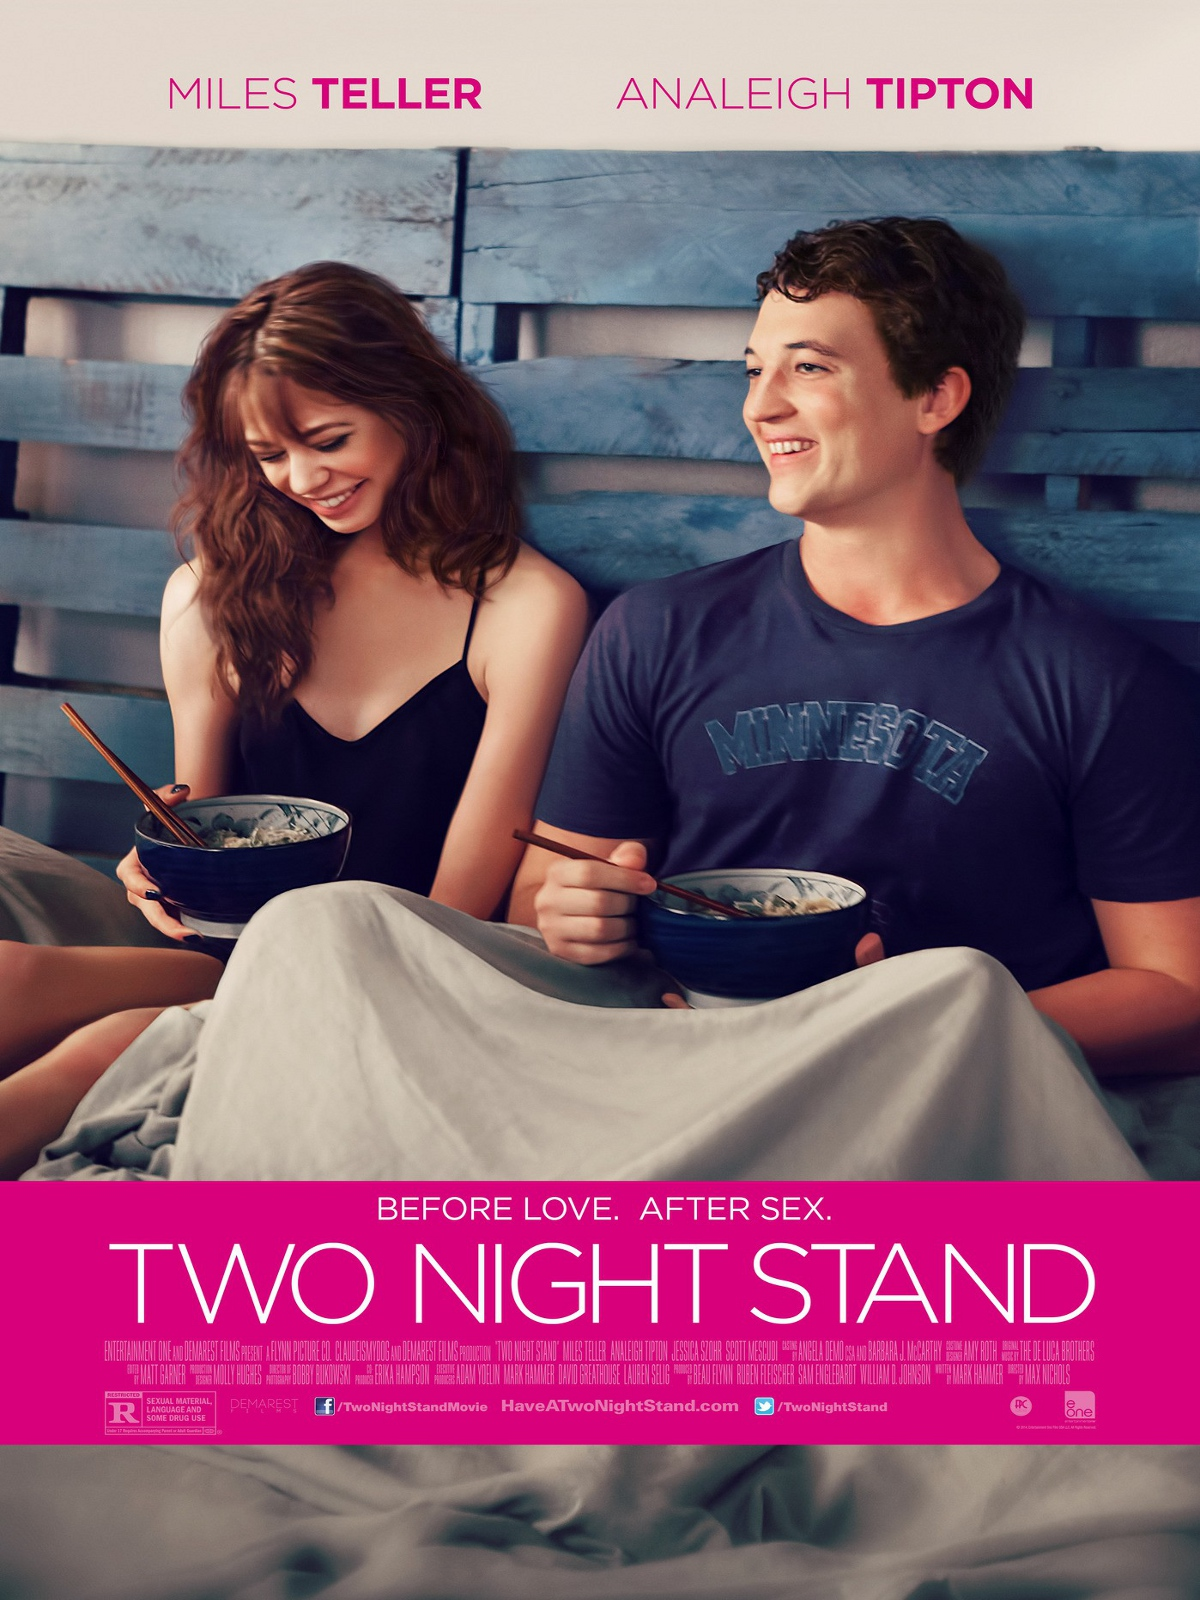 one night stand website bewertung